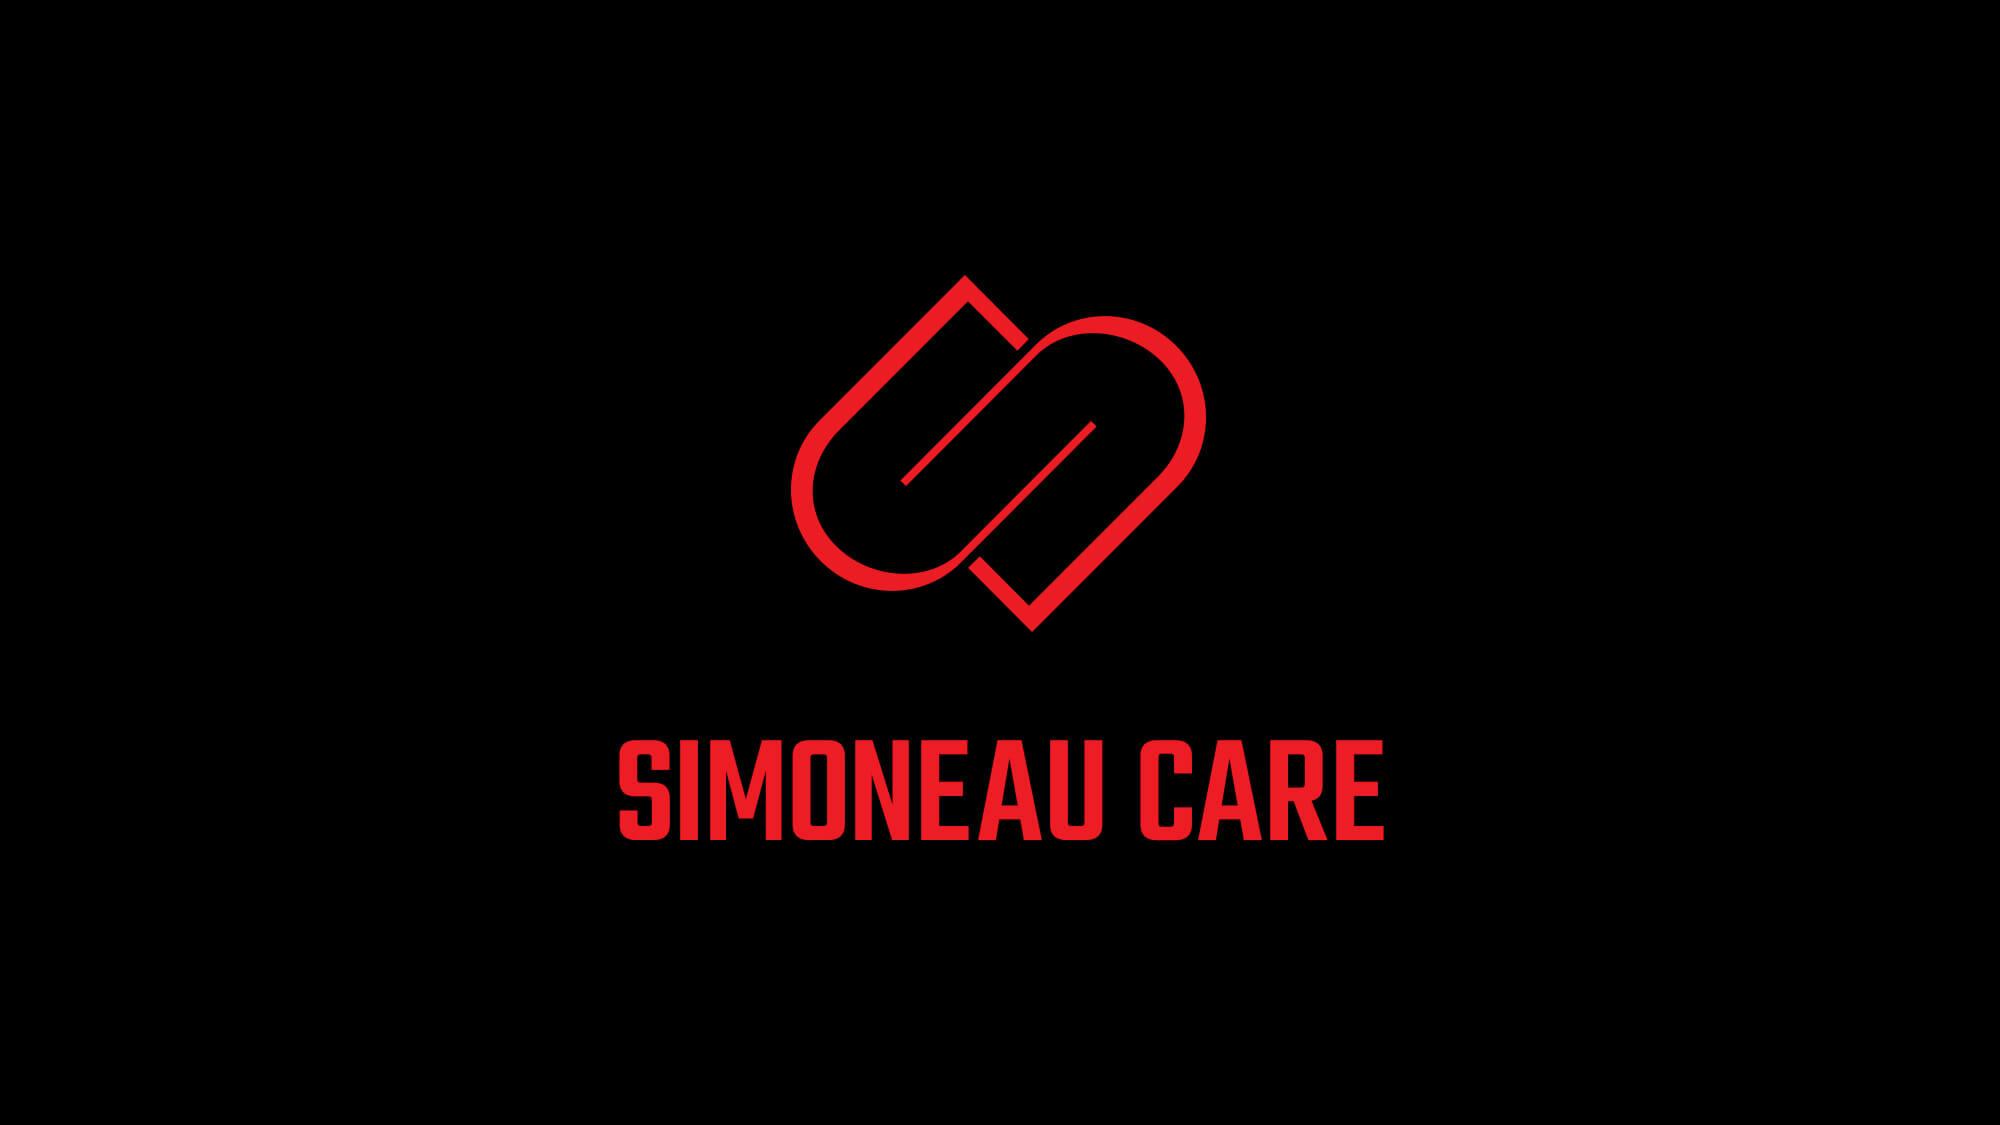 Simoneau Care Logo